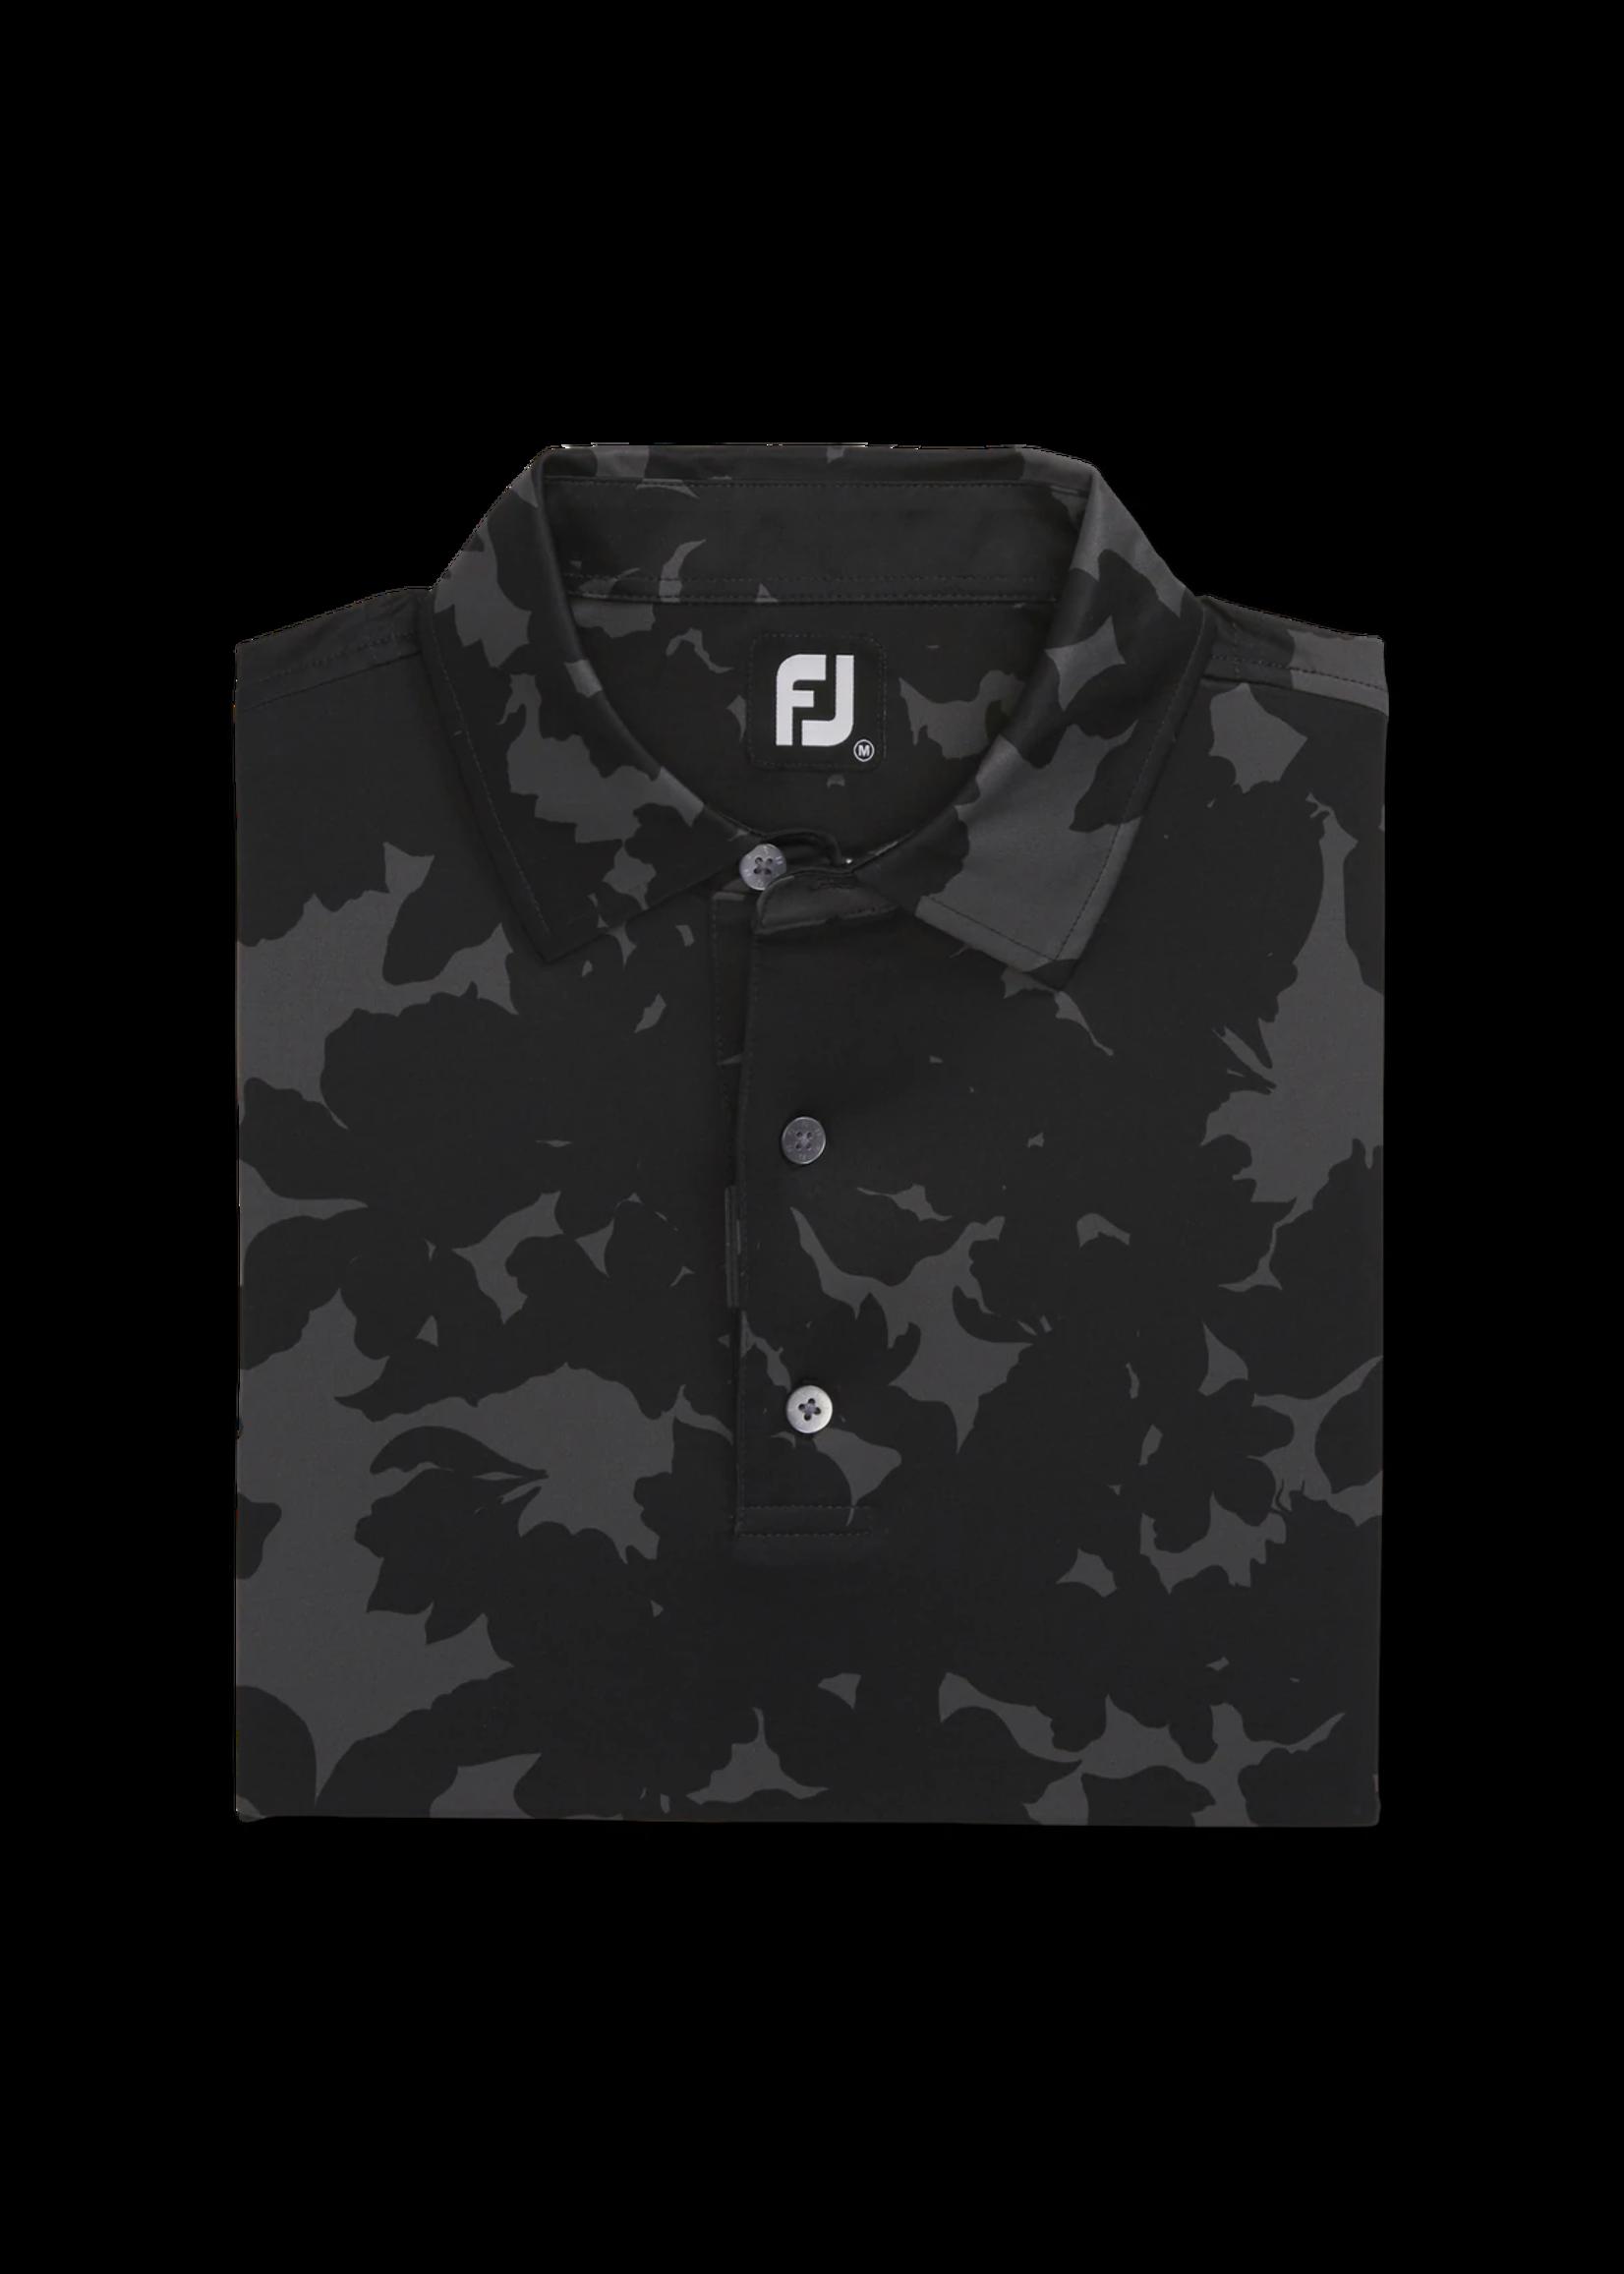 FJ Golf Shirt Floral